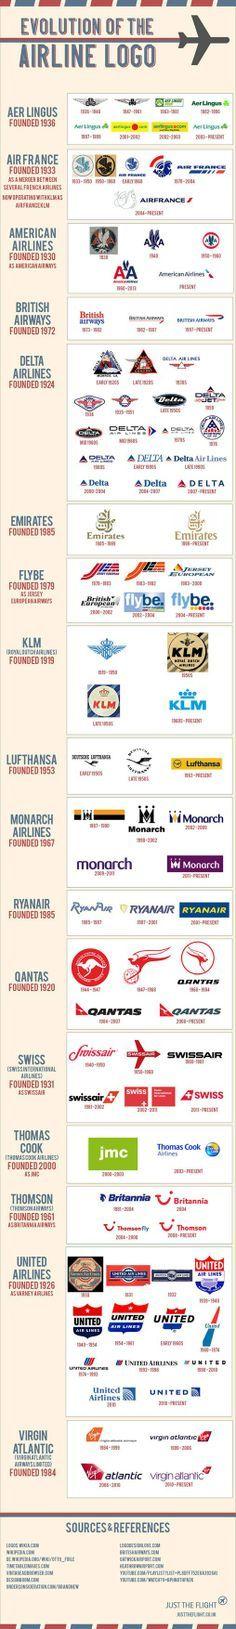 Evolution of the Airline Logo